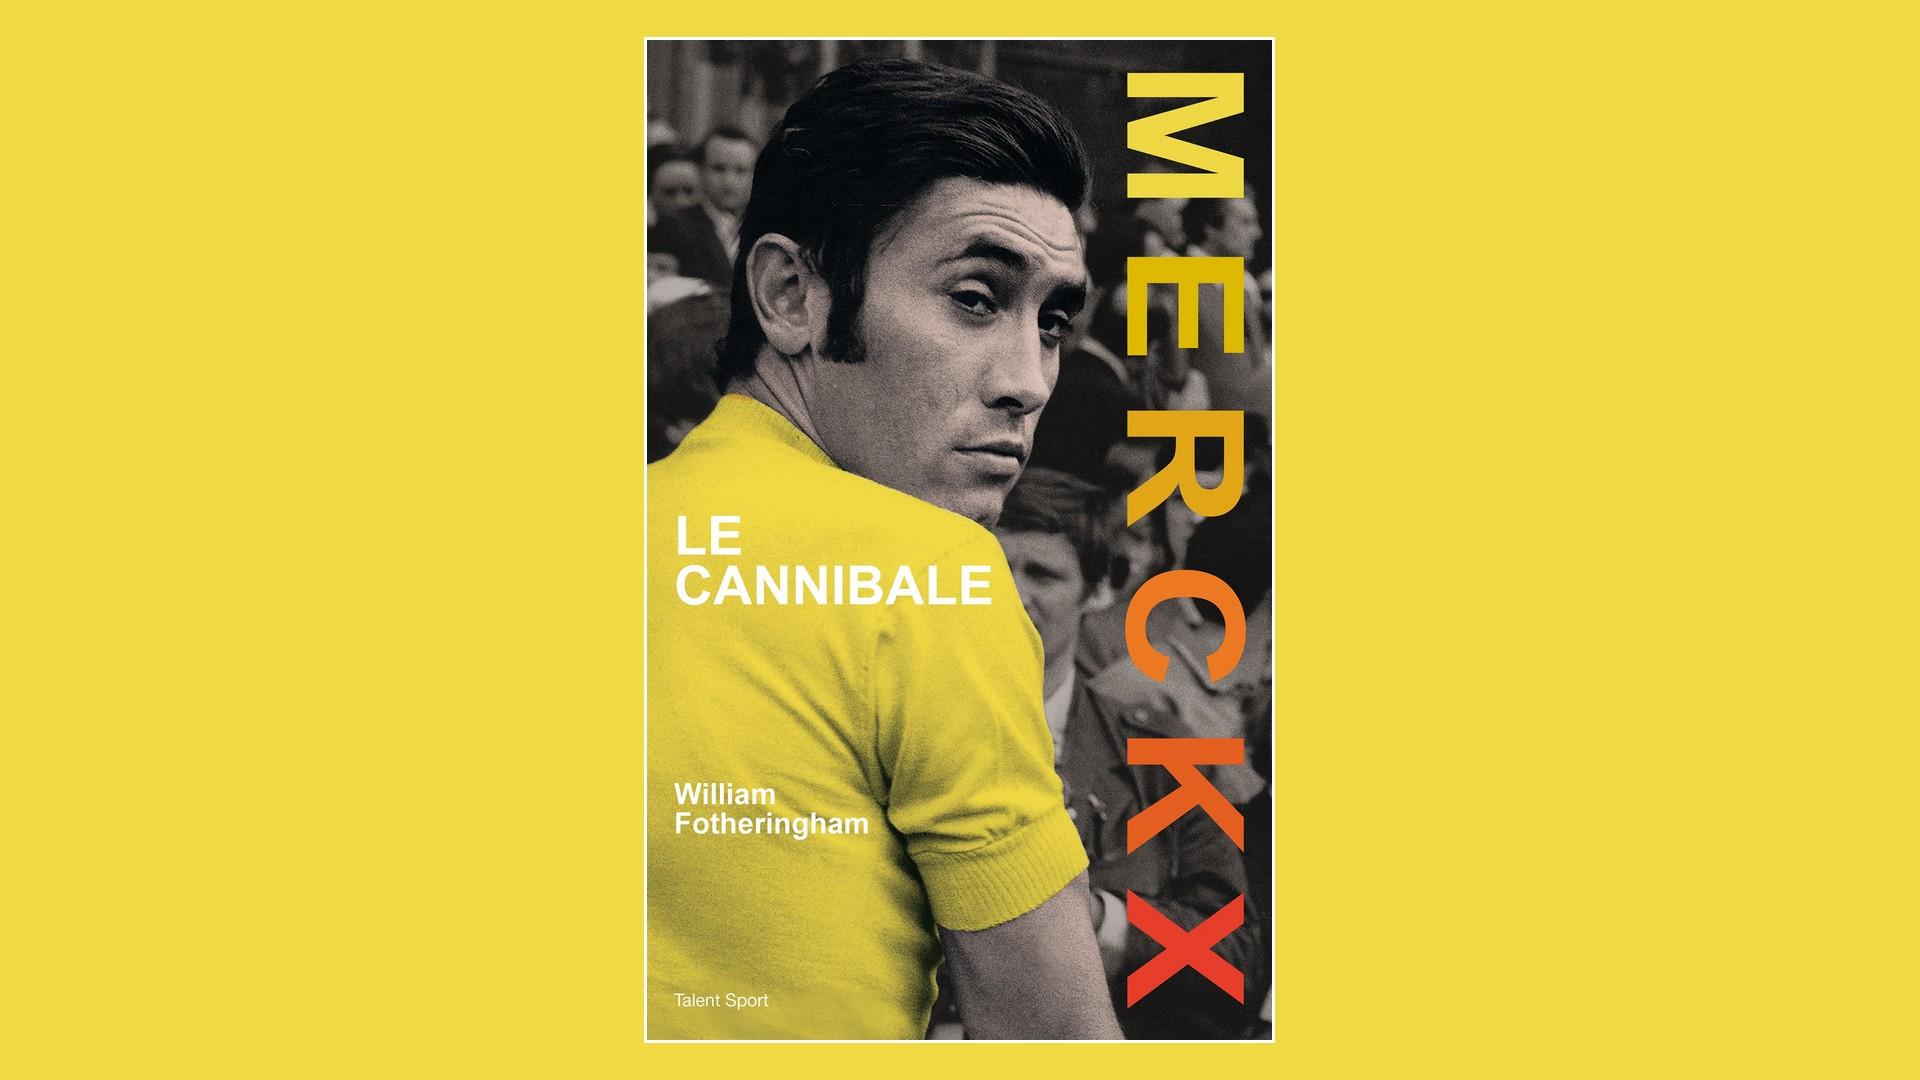 Livres – Merckx le cannibale – William Fotheringham 2017)